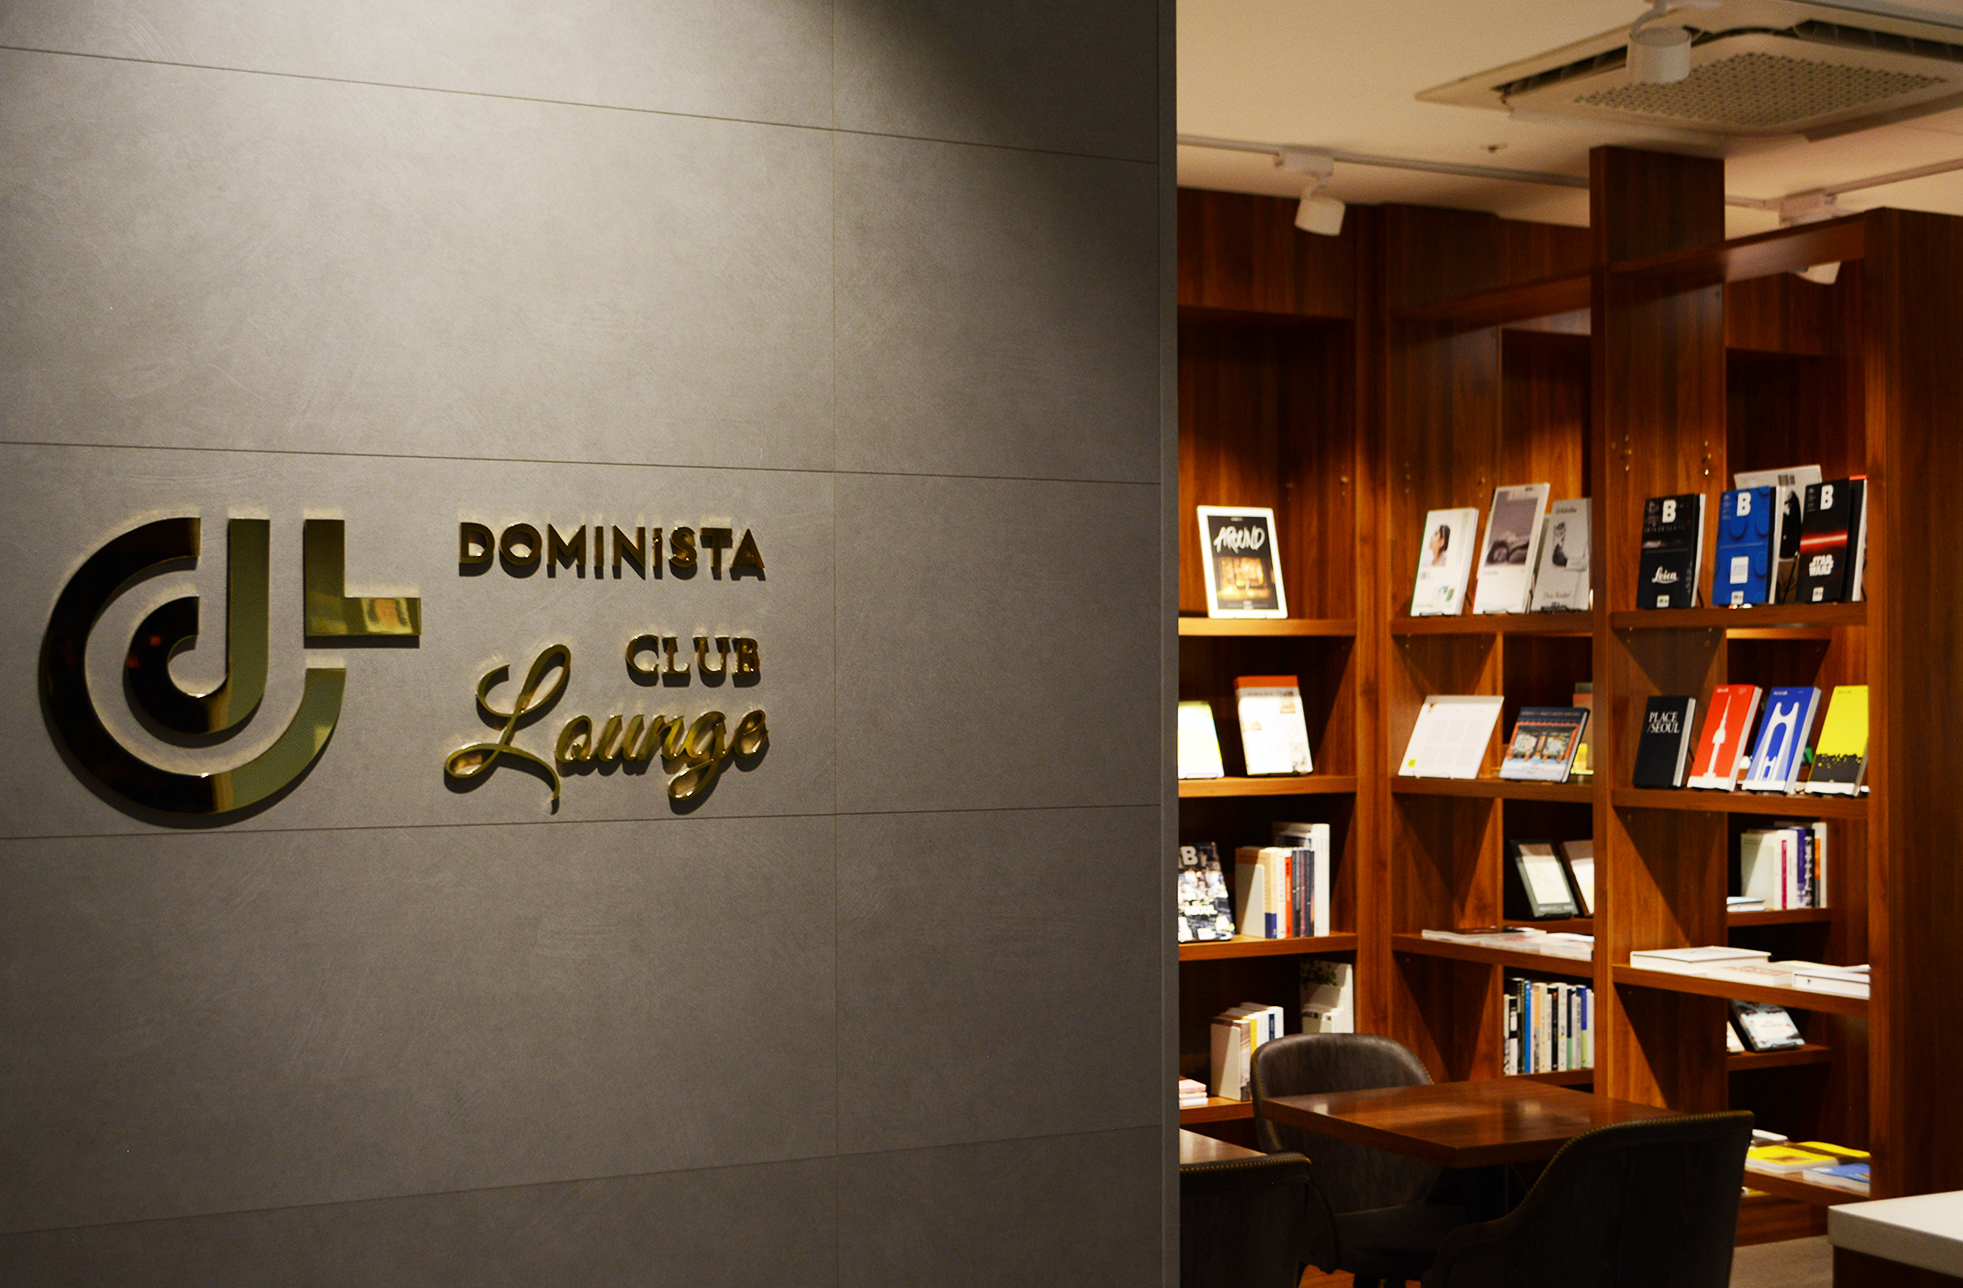 DOMINISTA CLUB LOUNGE(SEOUL カンナム編)